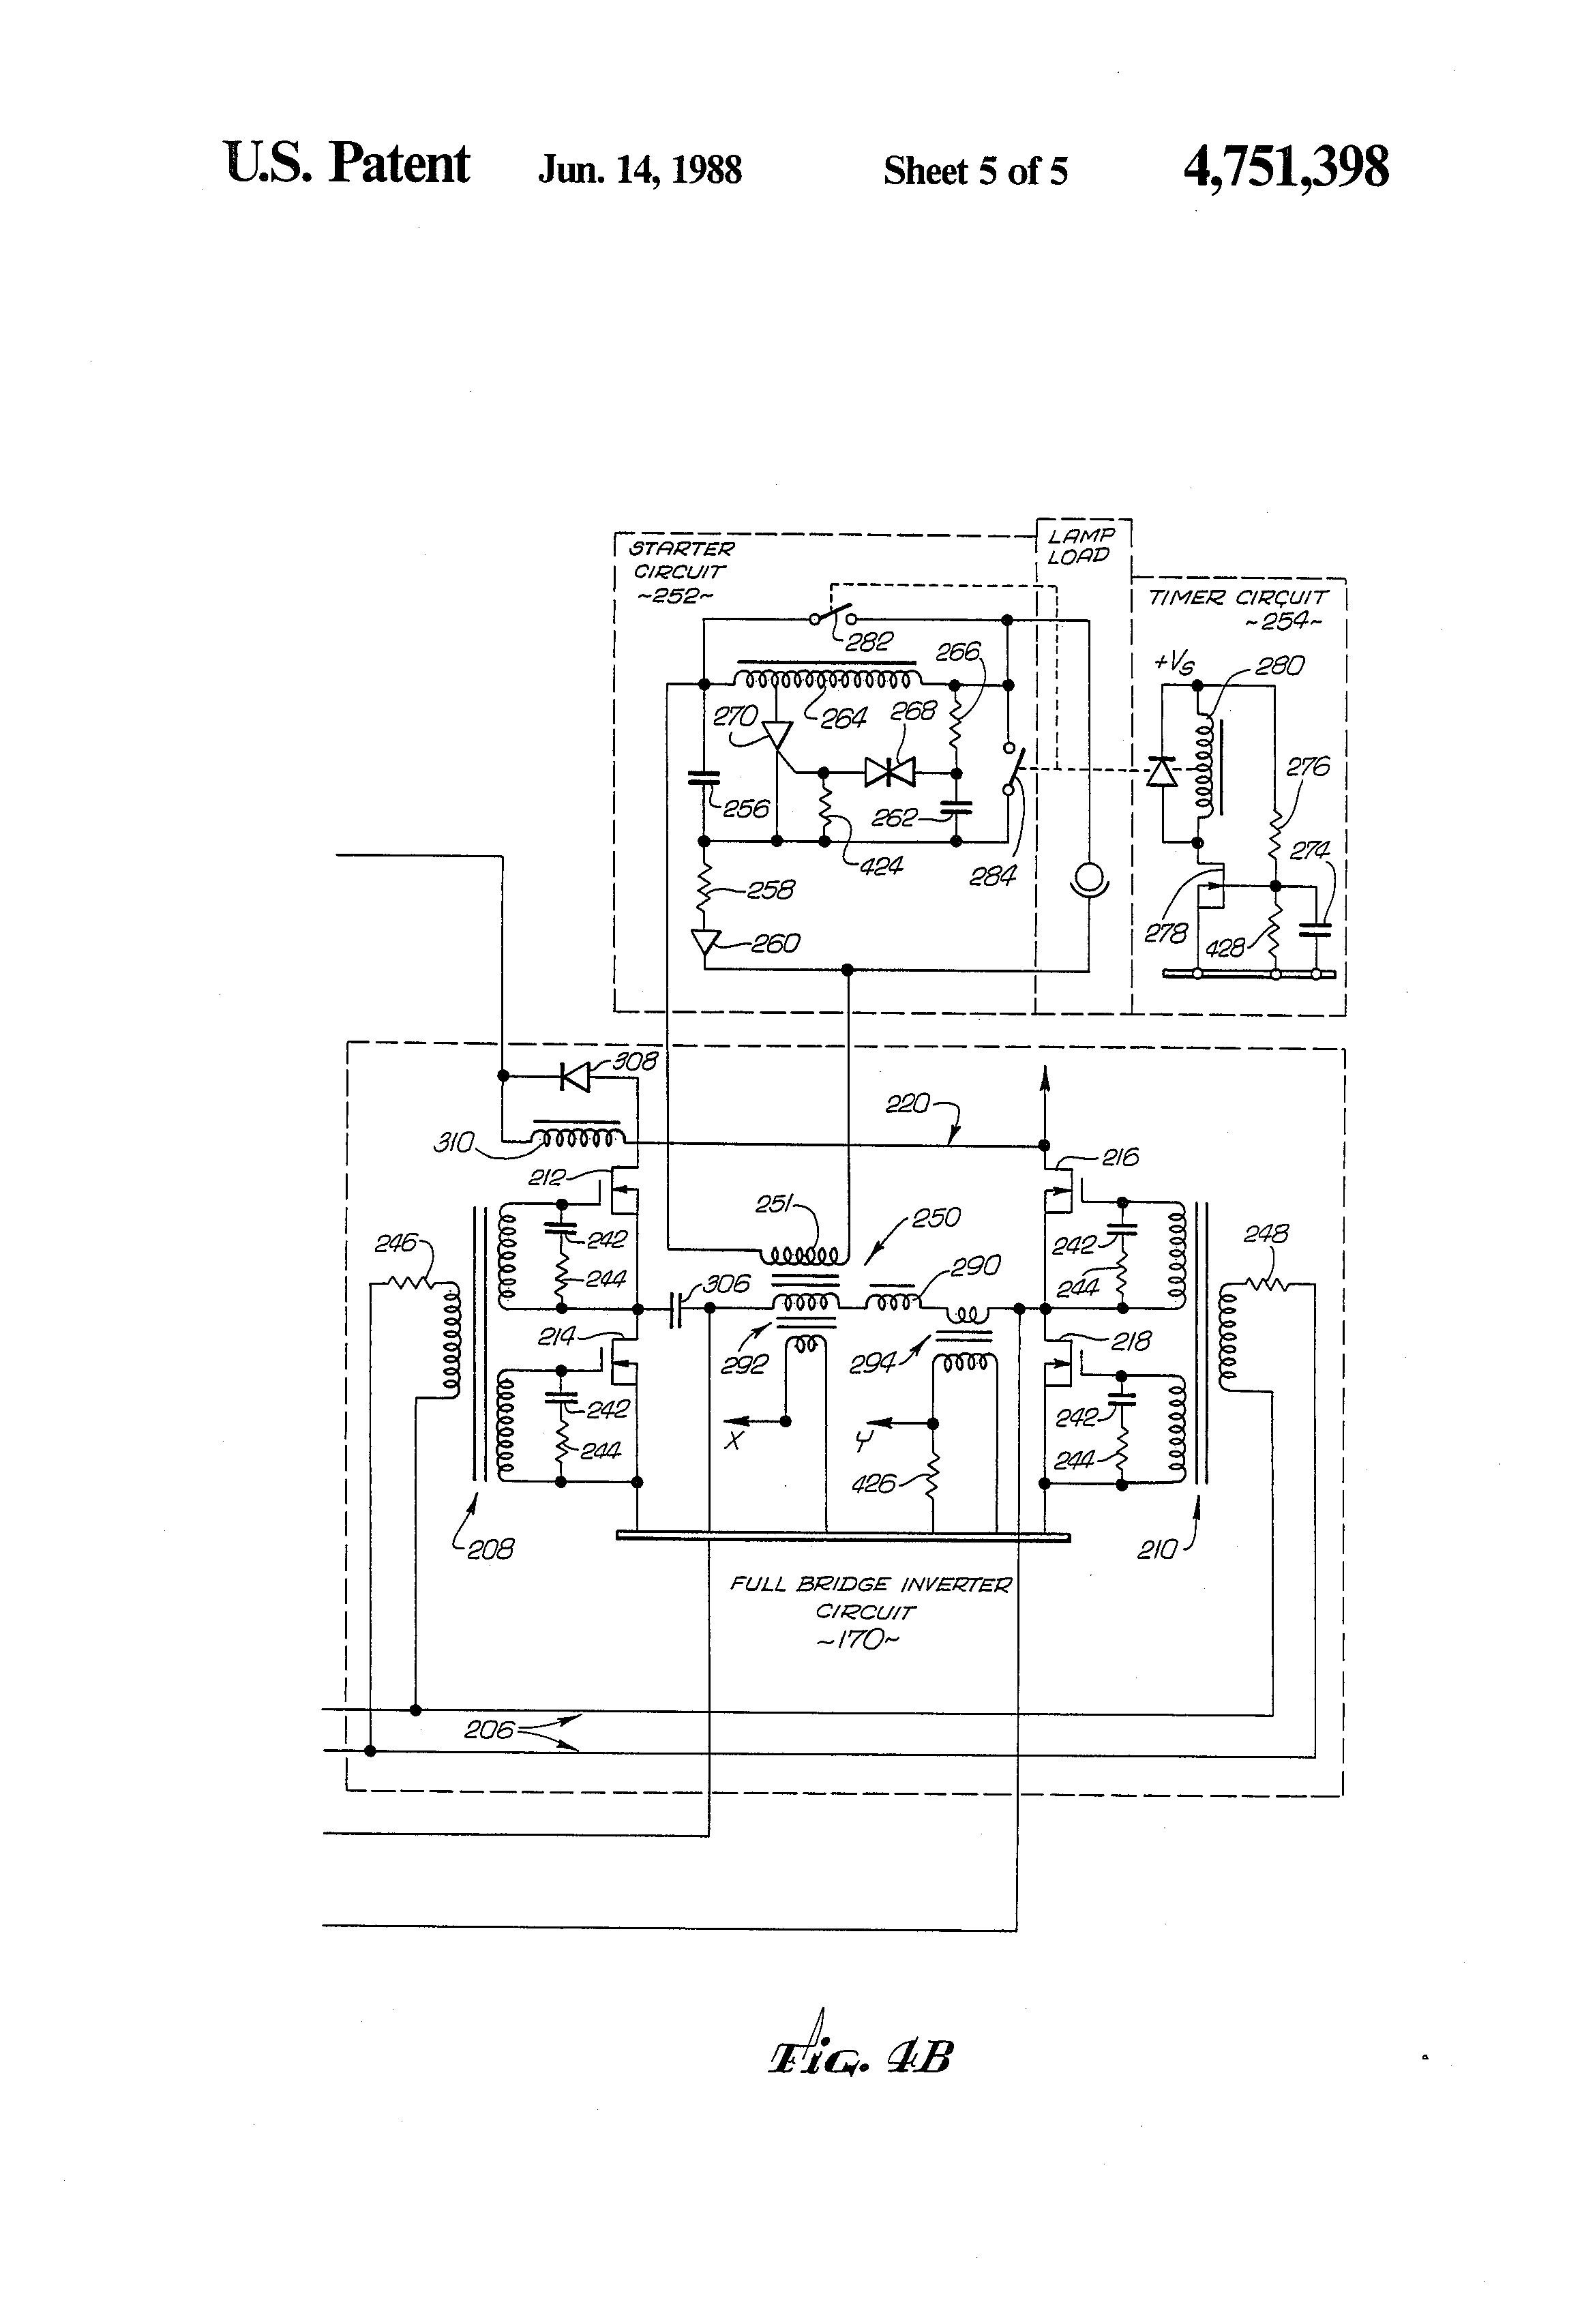 Metal Halide Ballast Wiring Diagram   Free Wiring Diagram on